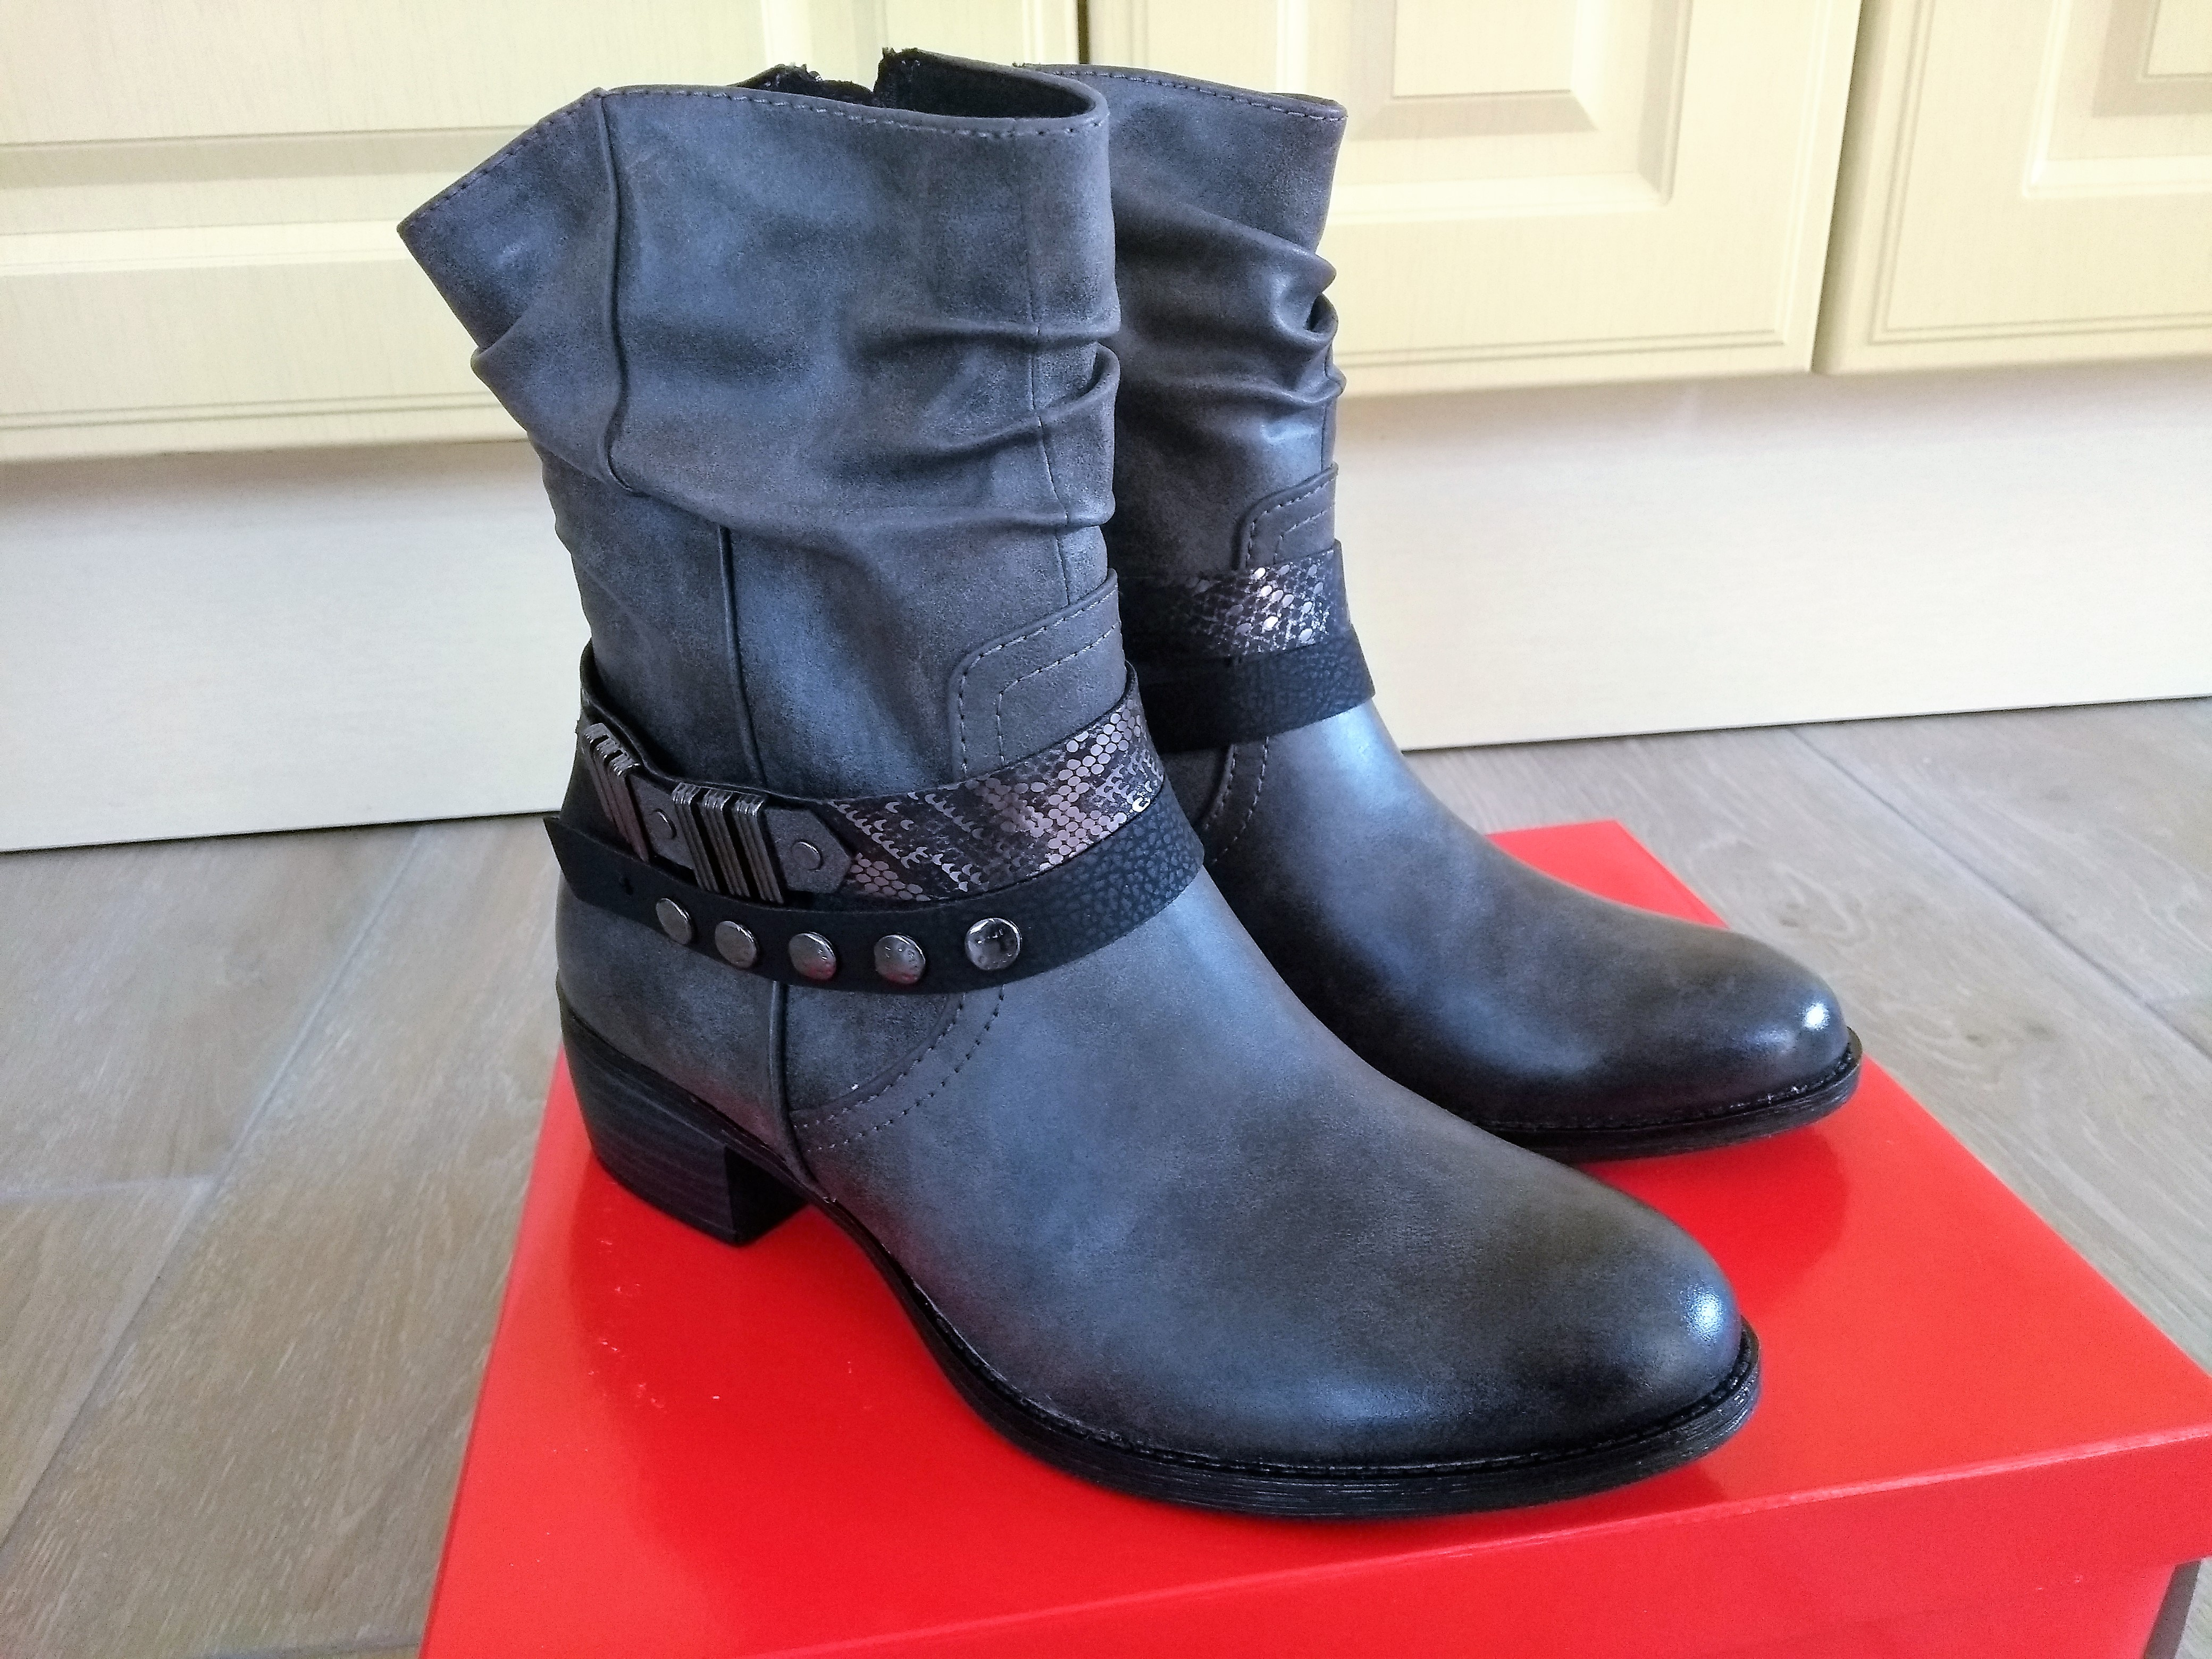 schoenen, laarsjes, nieuwe laarsjes, boots, enkellaarsjes, stoere laarjes, blog, mamablog, mamalifestyleblog, Lalog, La log blog, la log.nl